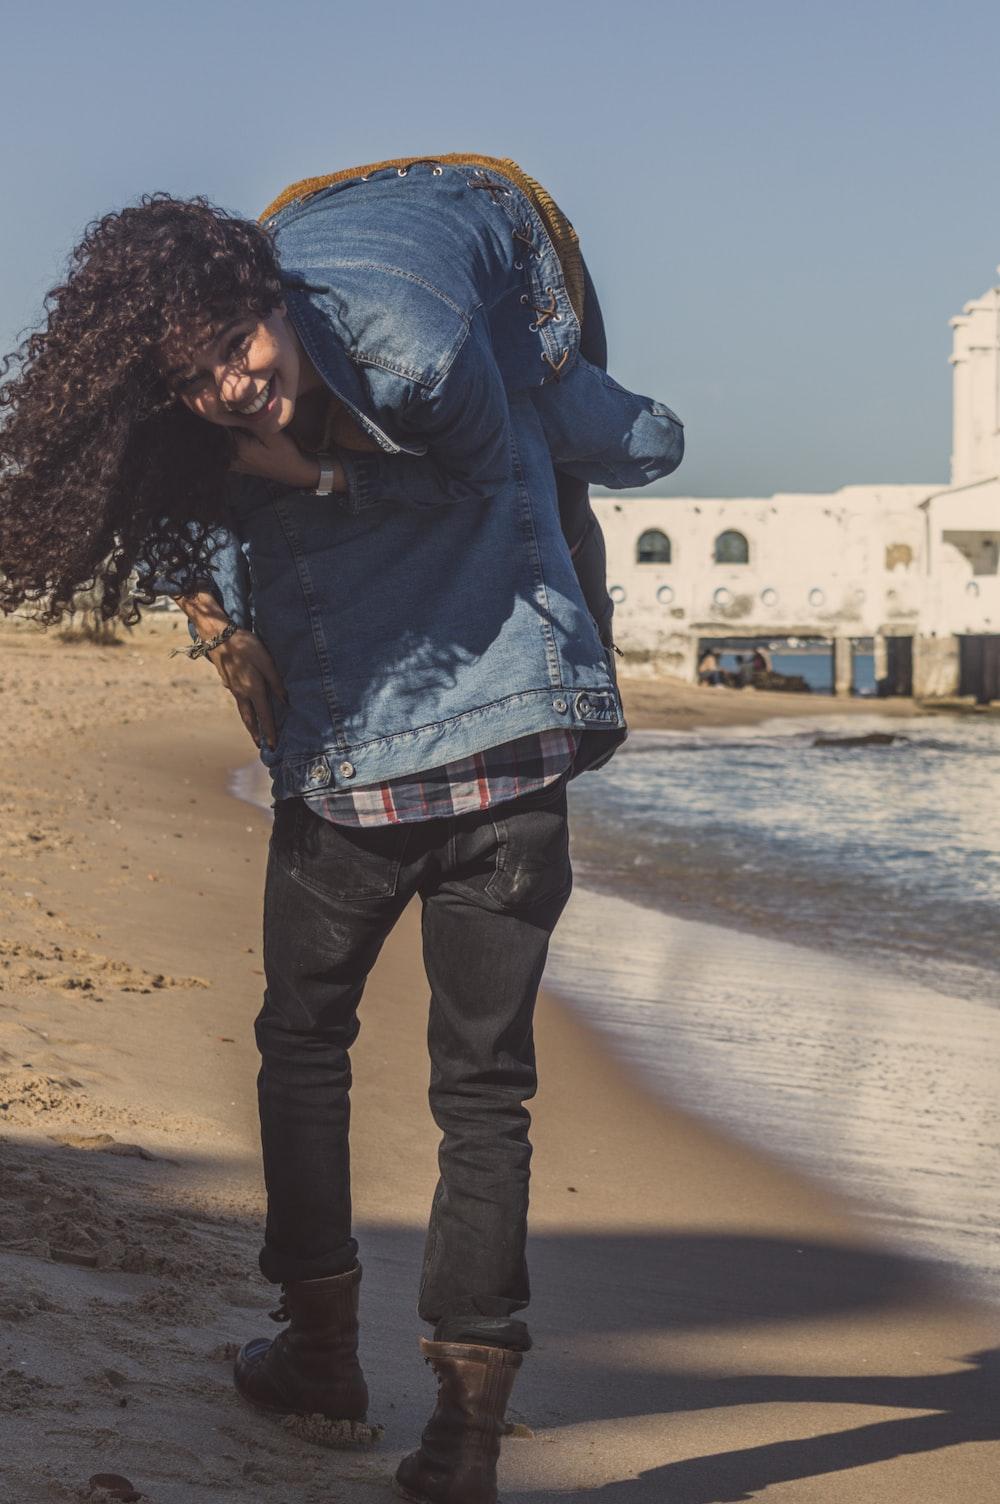 man carrying woman walking on seashoire